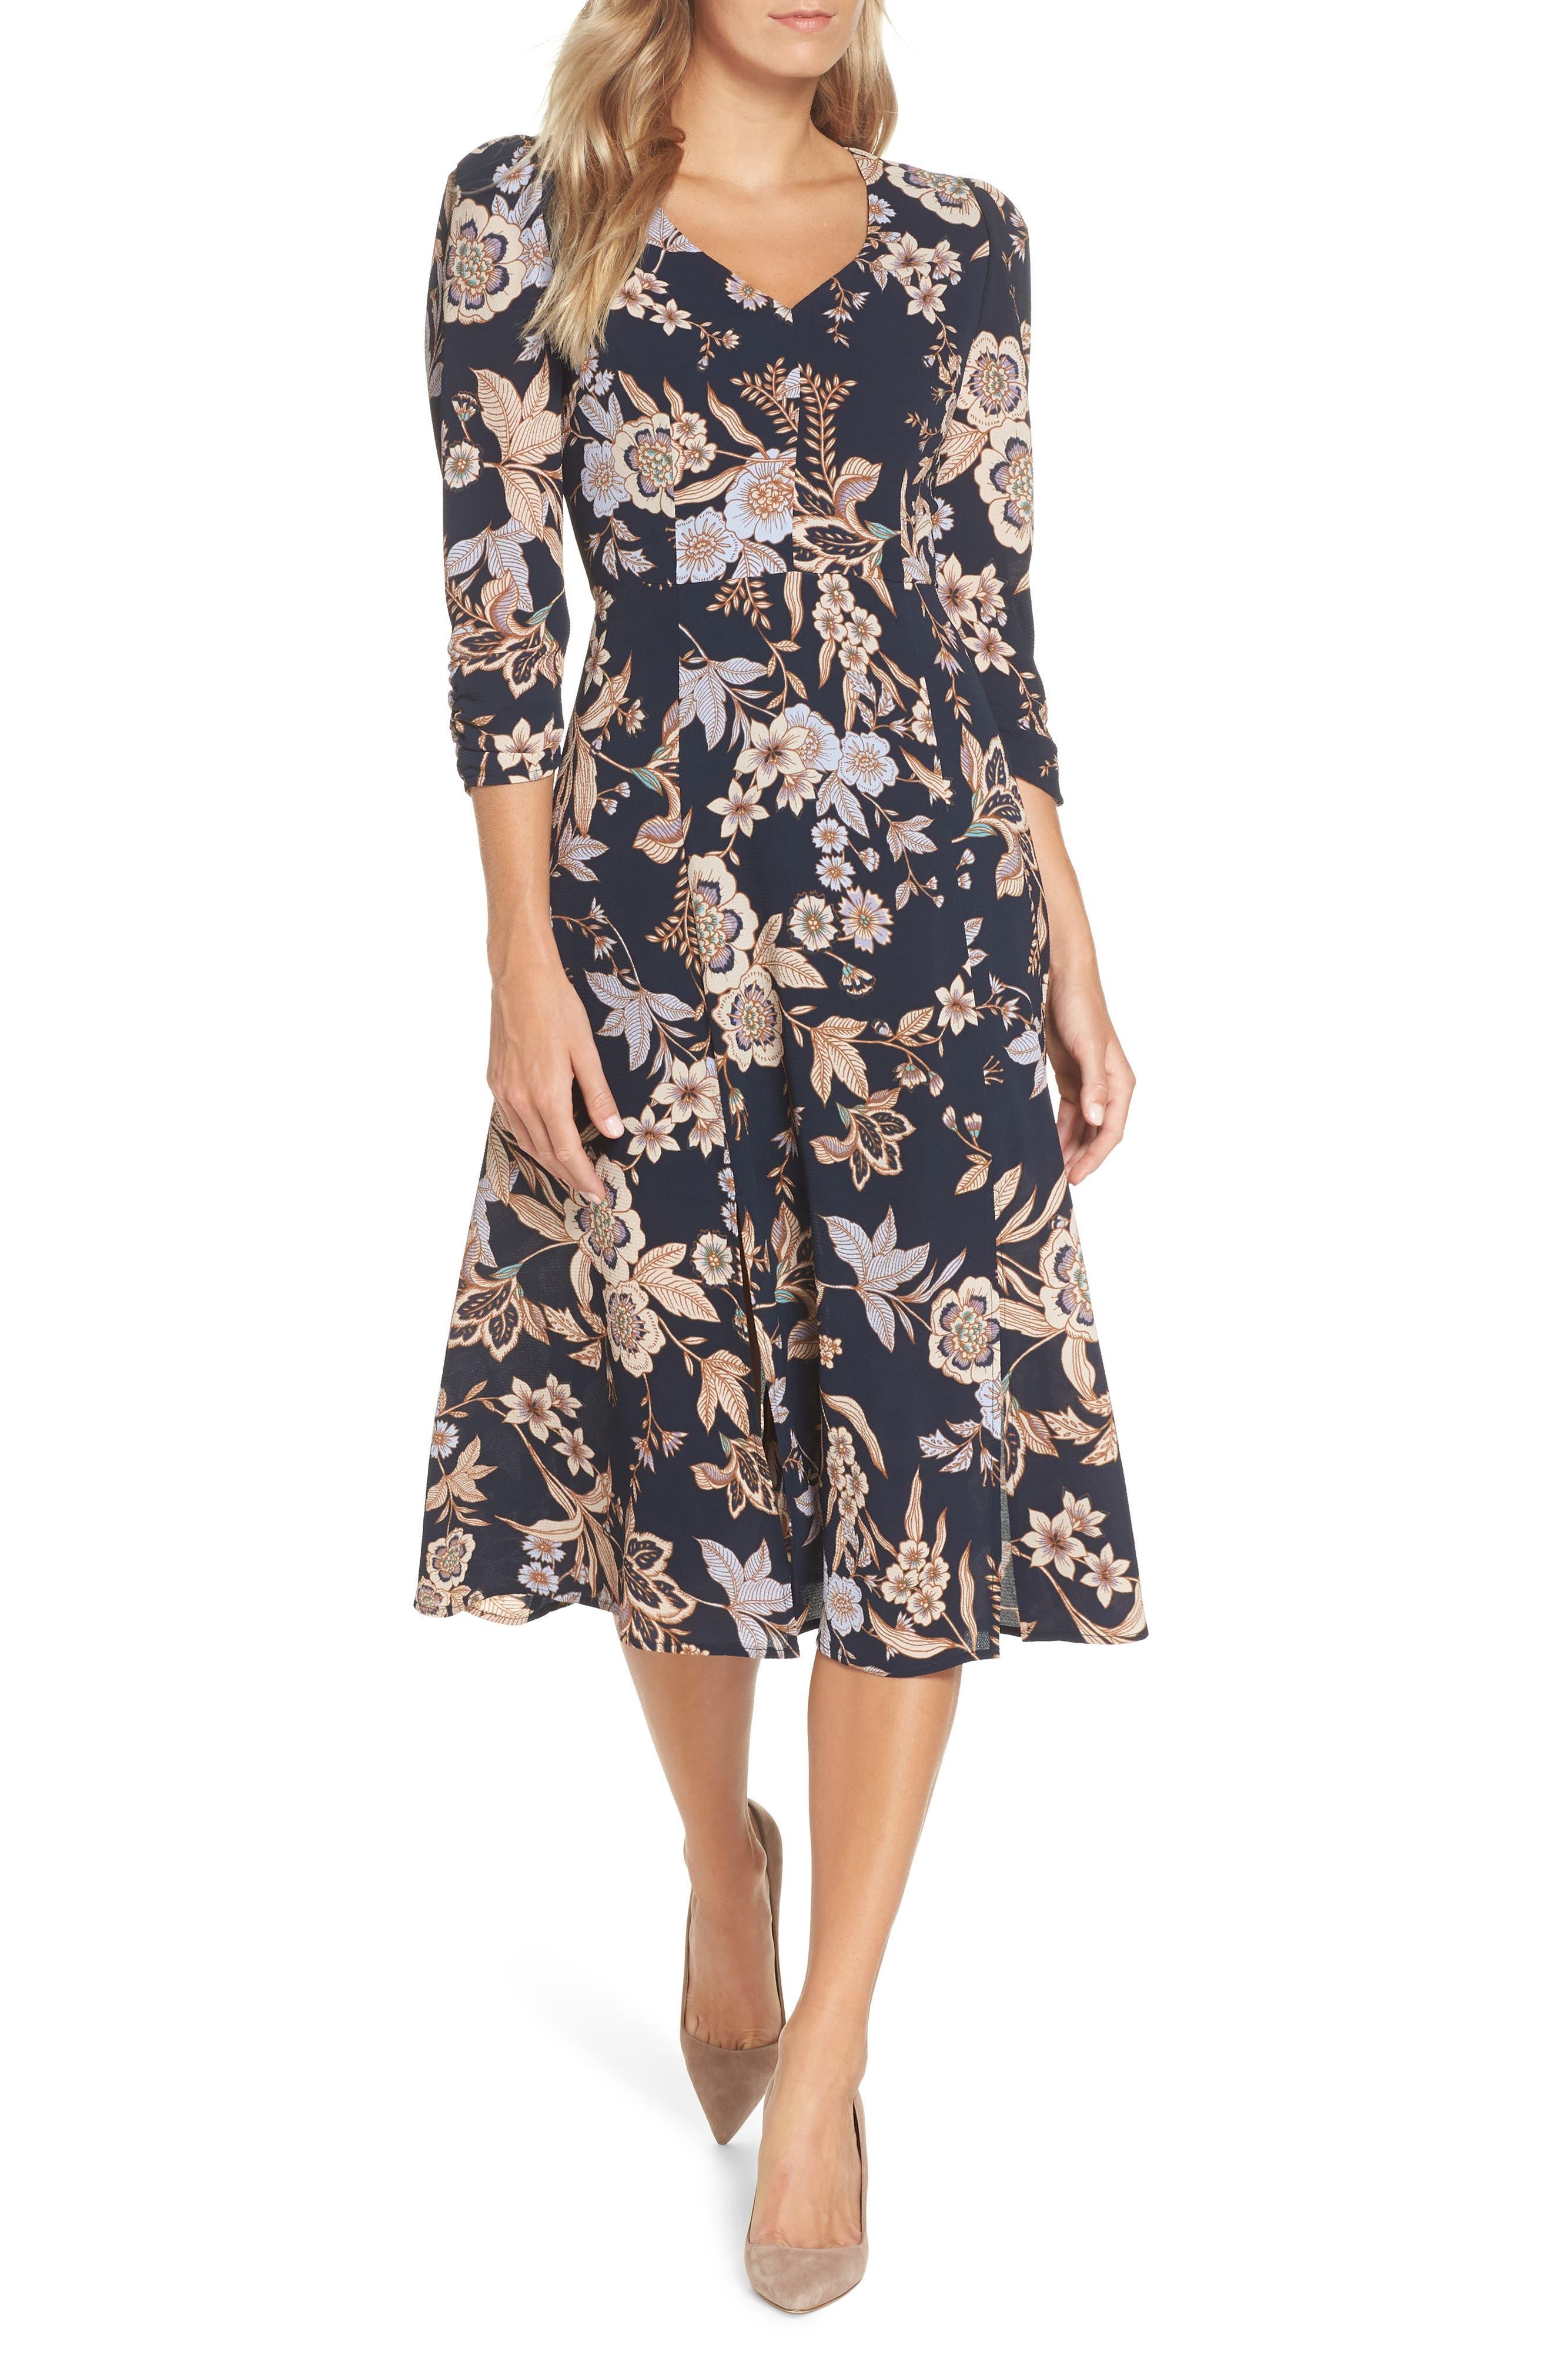 ELIZA J, Floral Midi Dress, Main thumbnail 1, color, 410